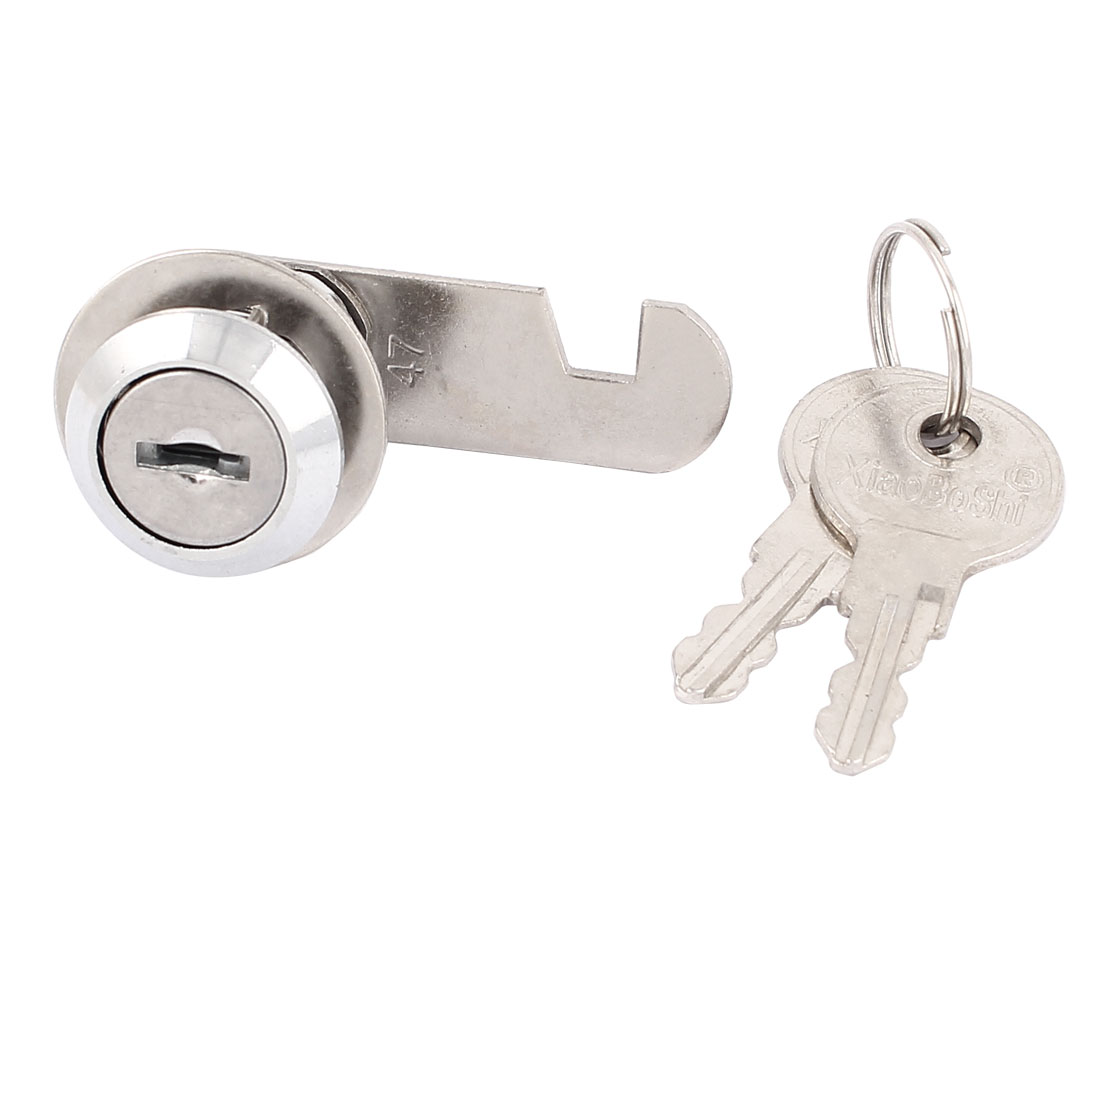 Door Cabinet Mailbox Drawer Security Tubular Cam Lock Camlock w 2 Keys